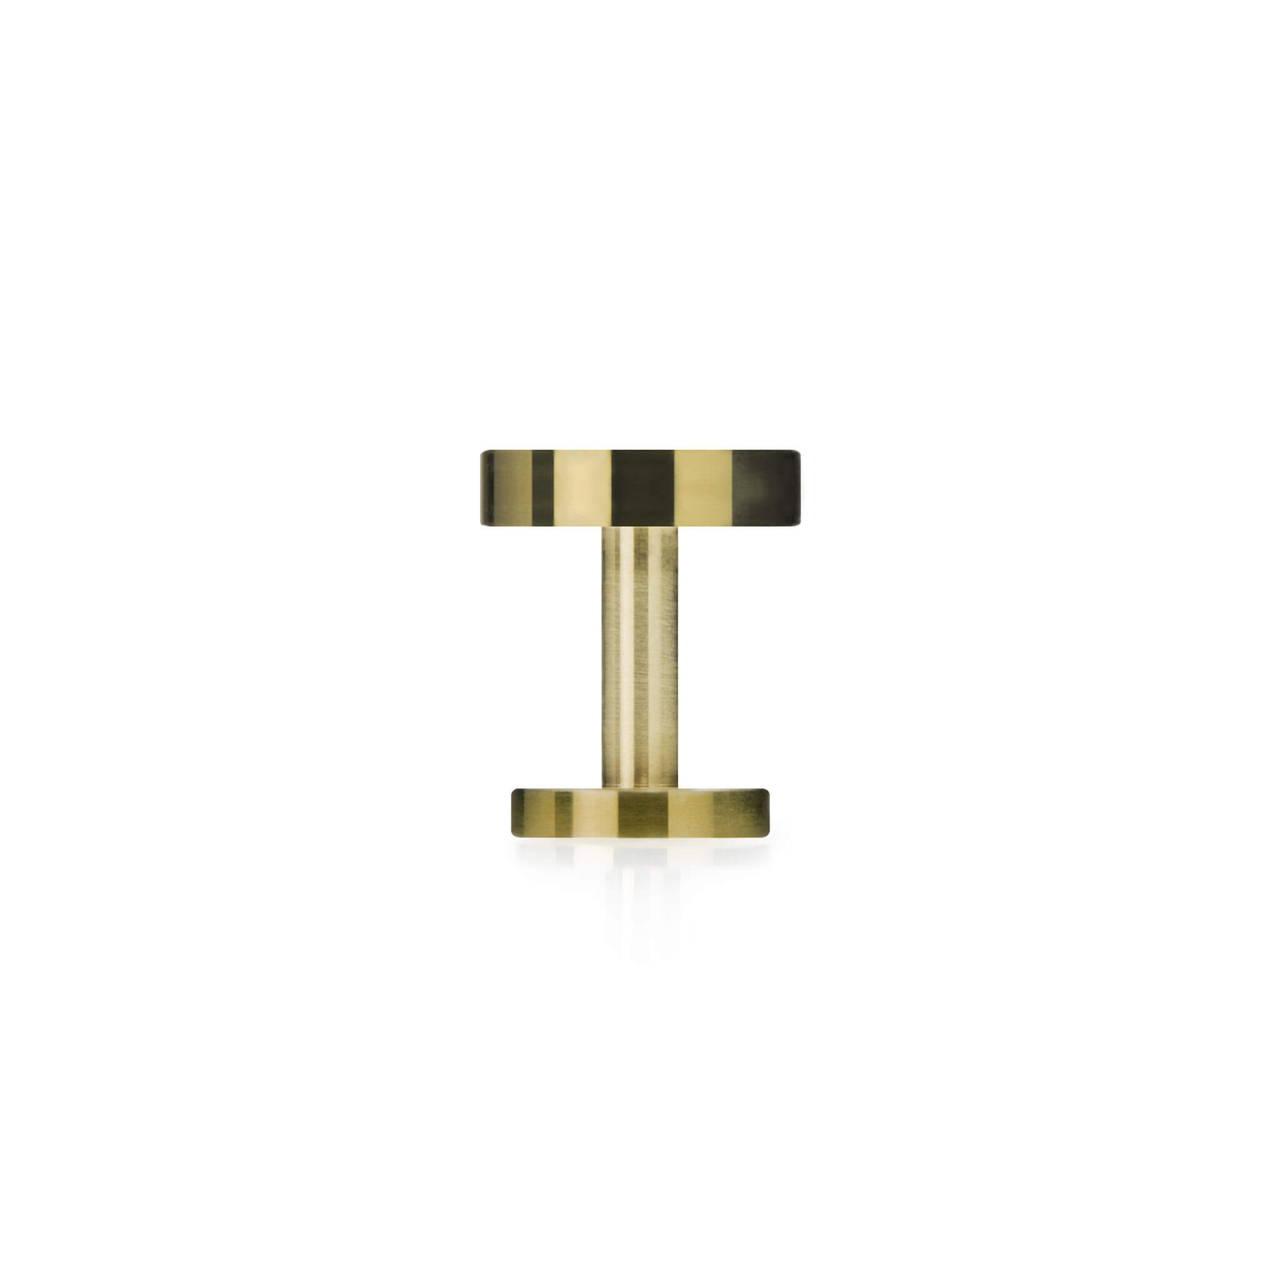 Brass Cufflink